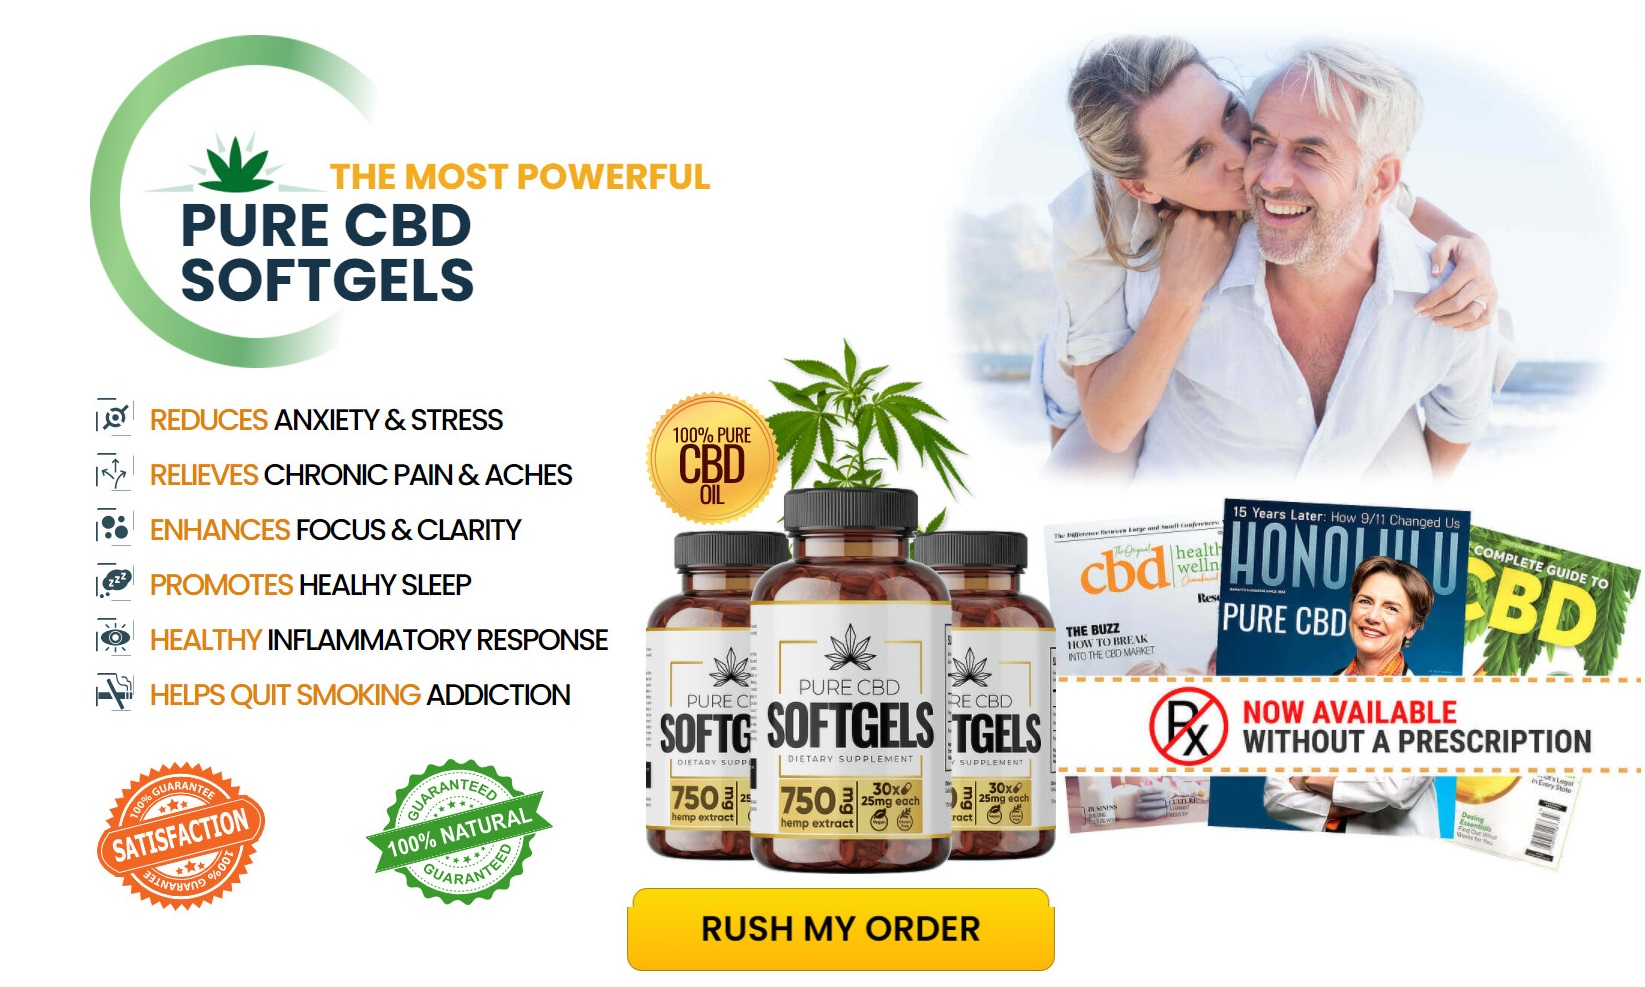 Pure CBD SoftGels Buy Now